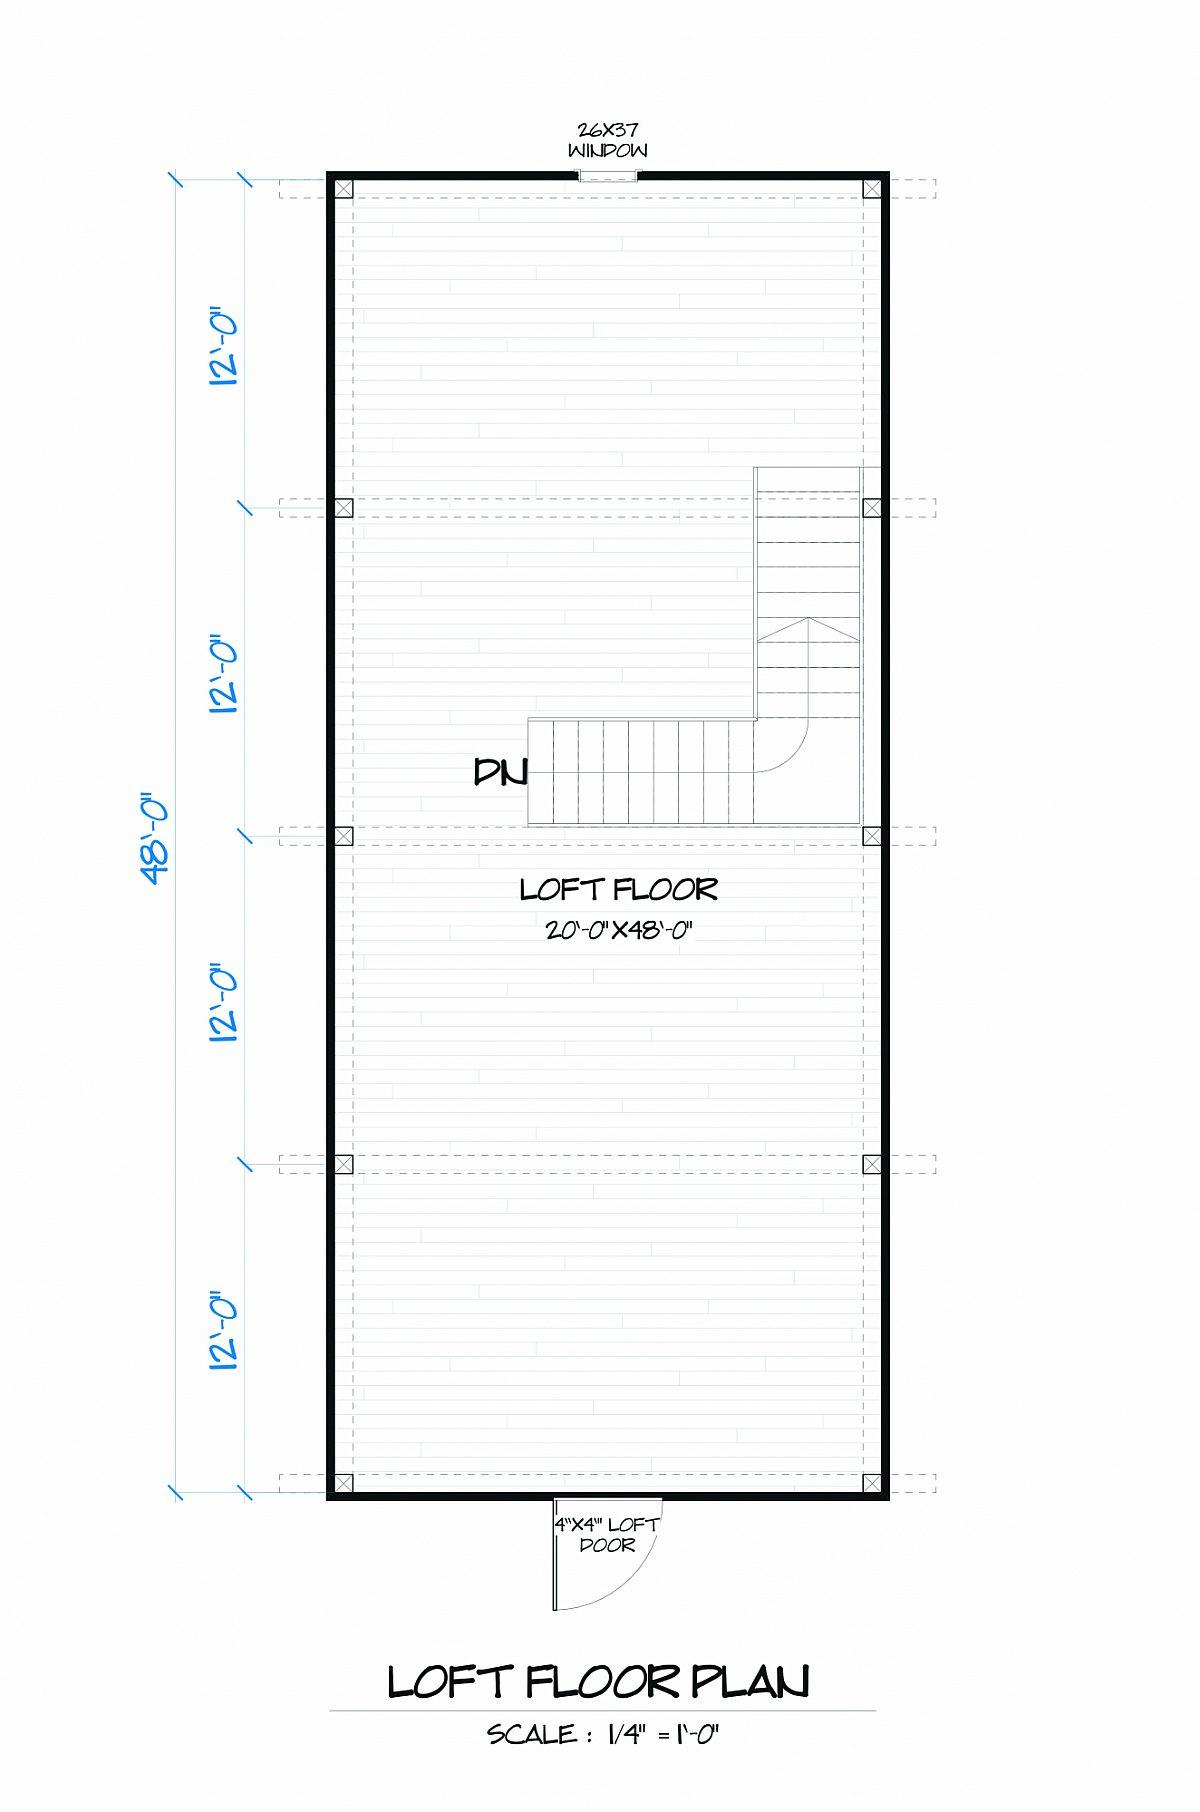 Timberlyne Gunnar Barn Loft Floor Plan